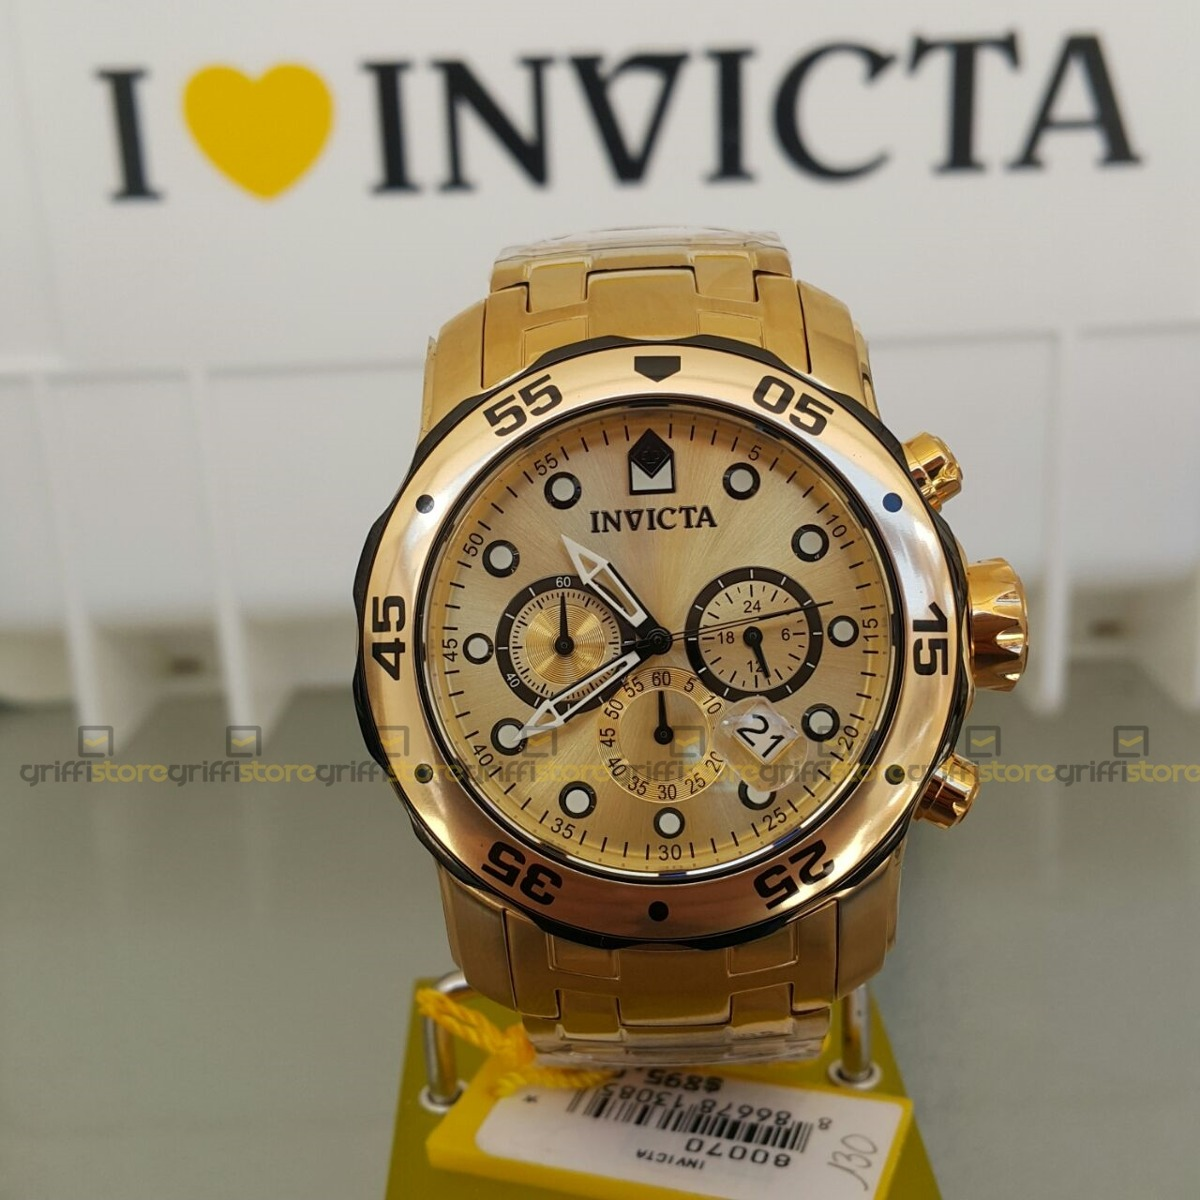 161c8ad8d35 relógio invicta pro diver 80070 original 48mm original crono. Carregando  zoom.